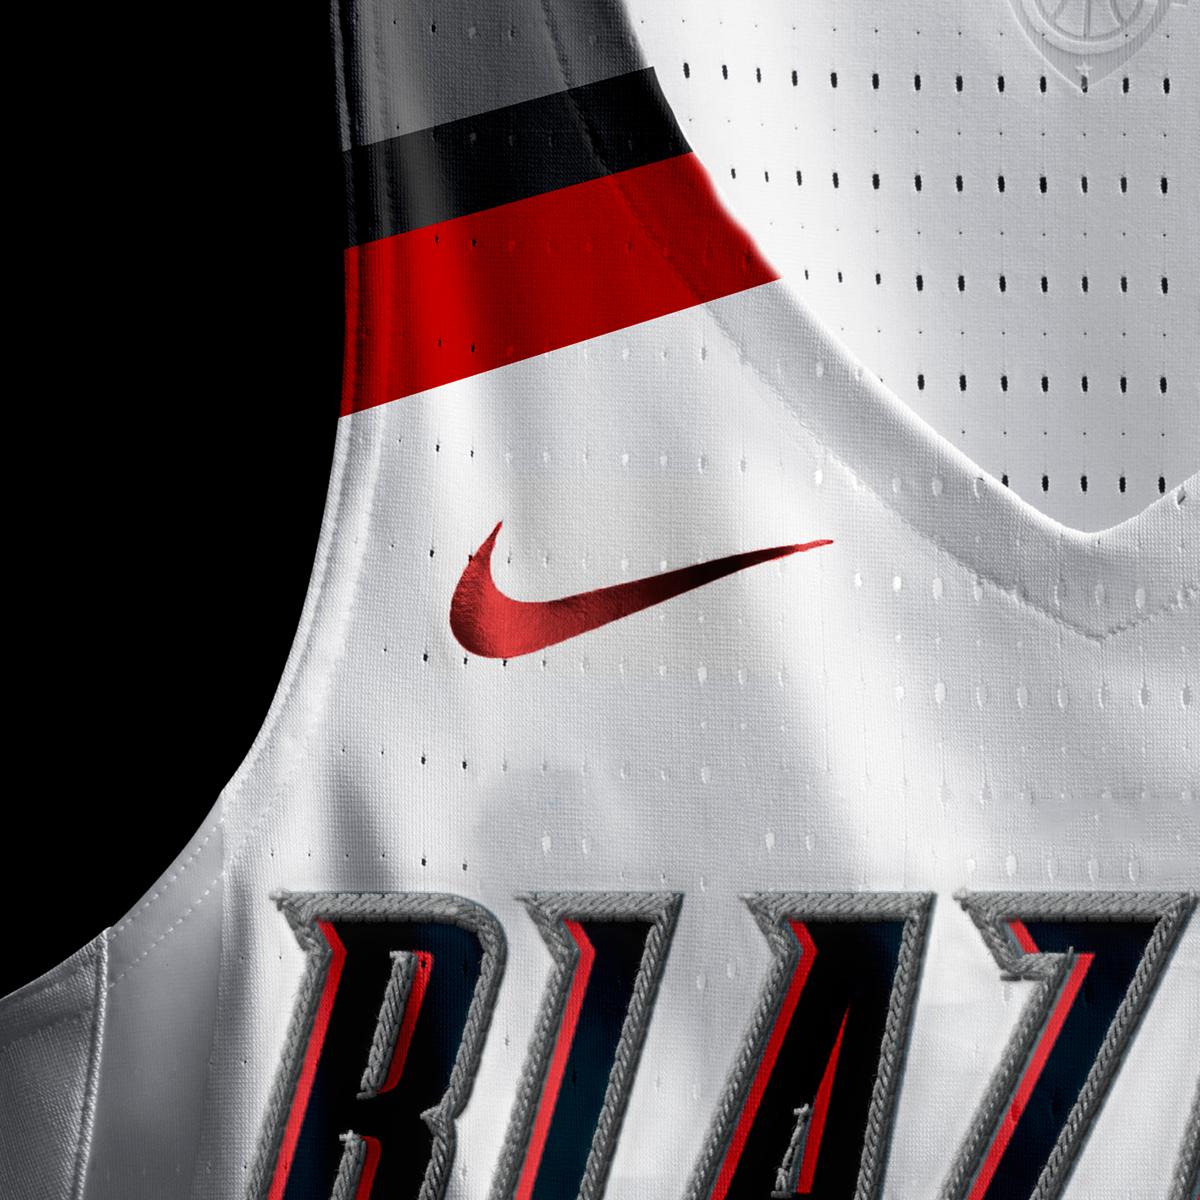 low cost 994c6 91724 Portland Trailblazers 2017-2016 Nike Concept Jersey on Behance